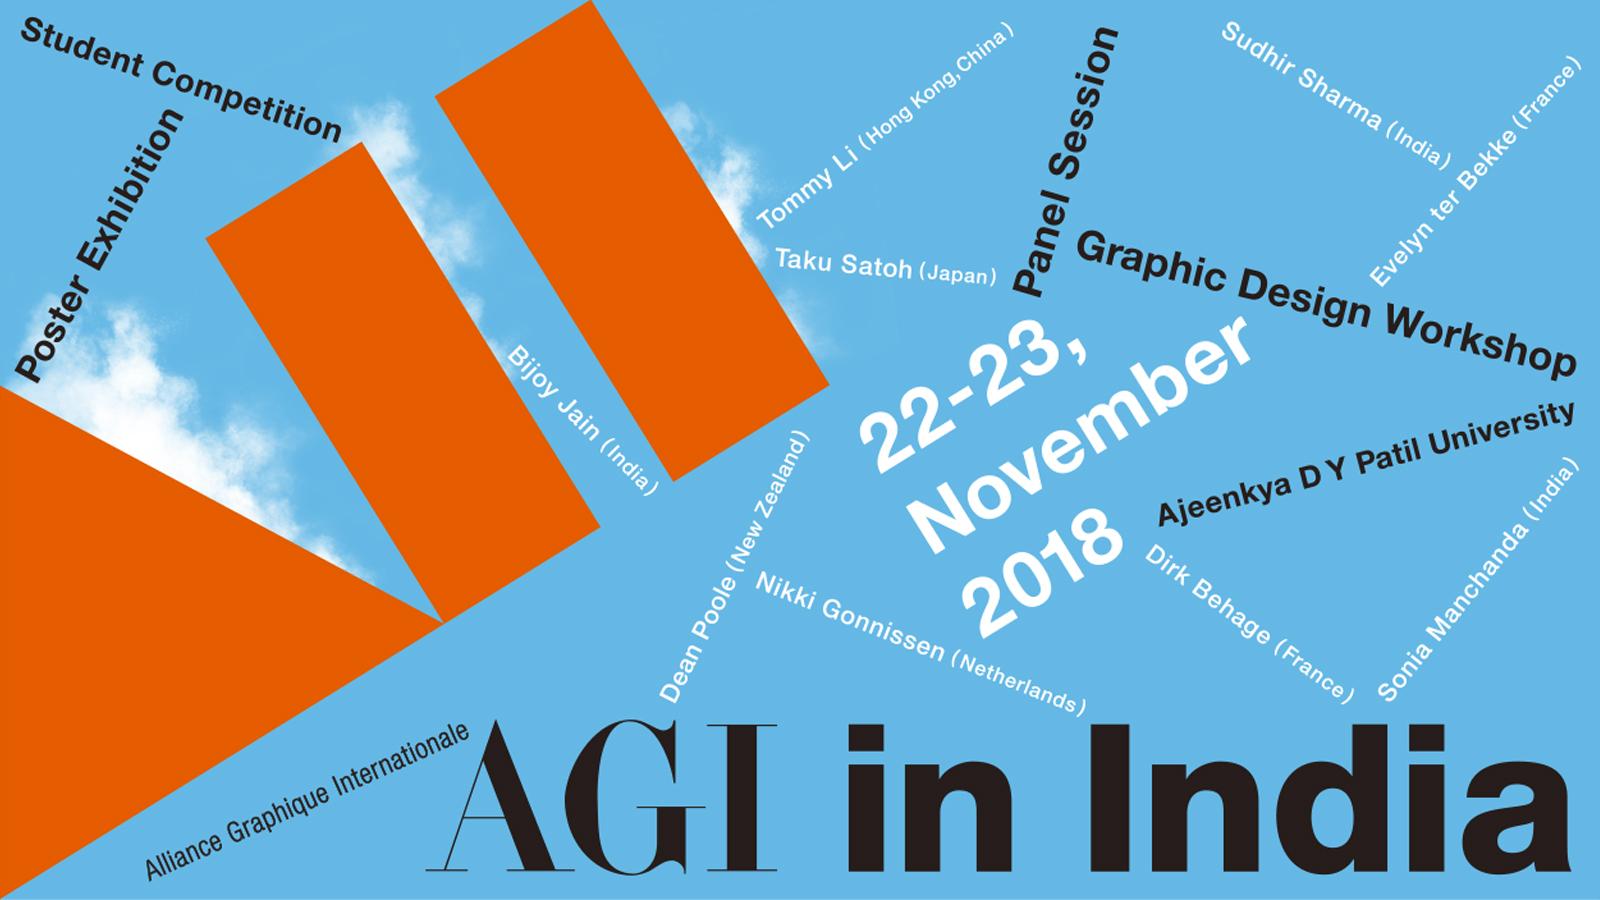 AGI_in_India_WEB_top_350dpi_1009.jpg